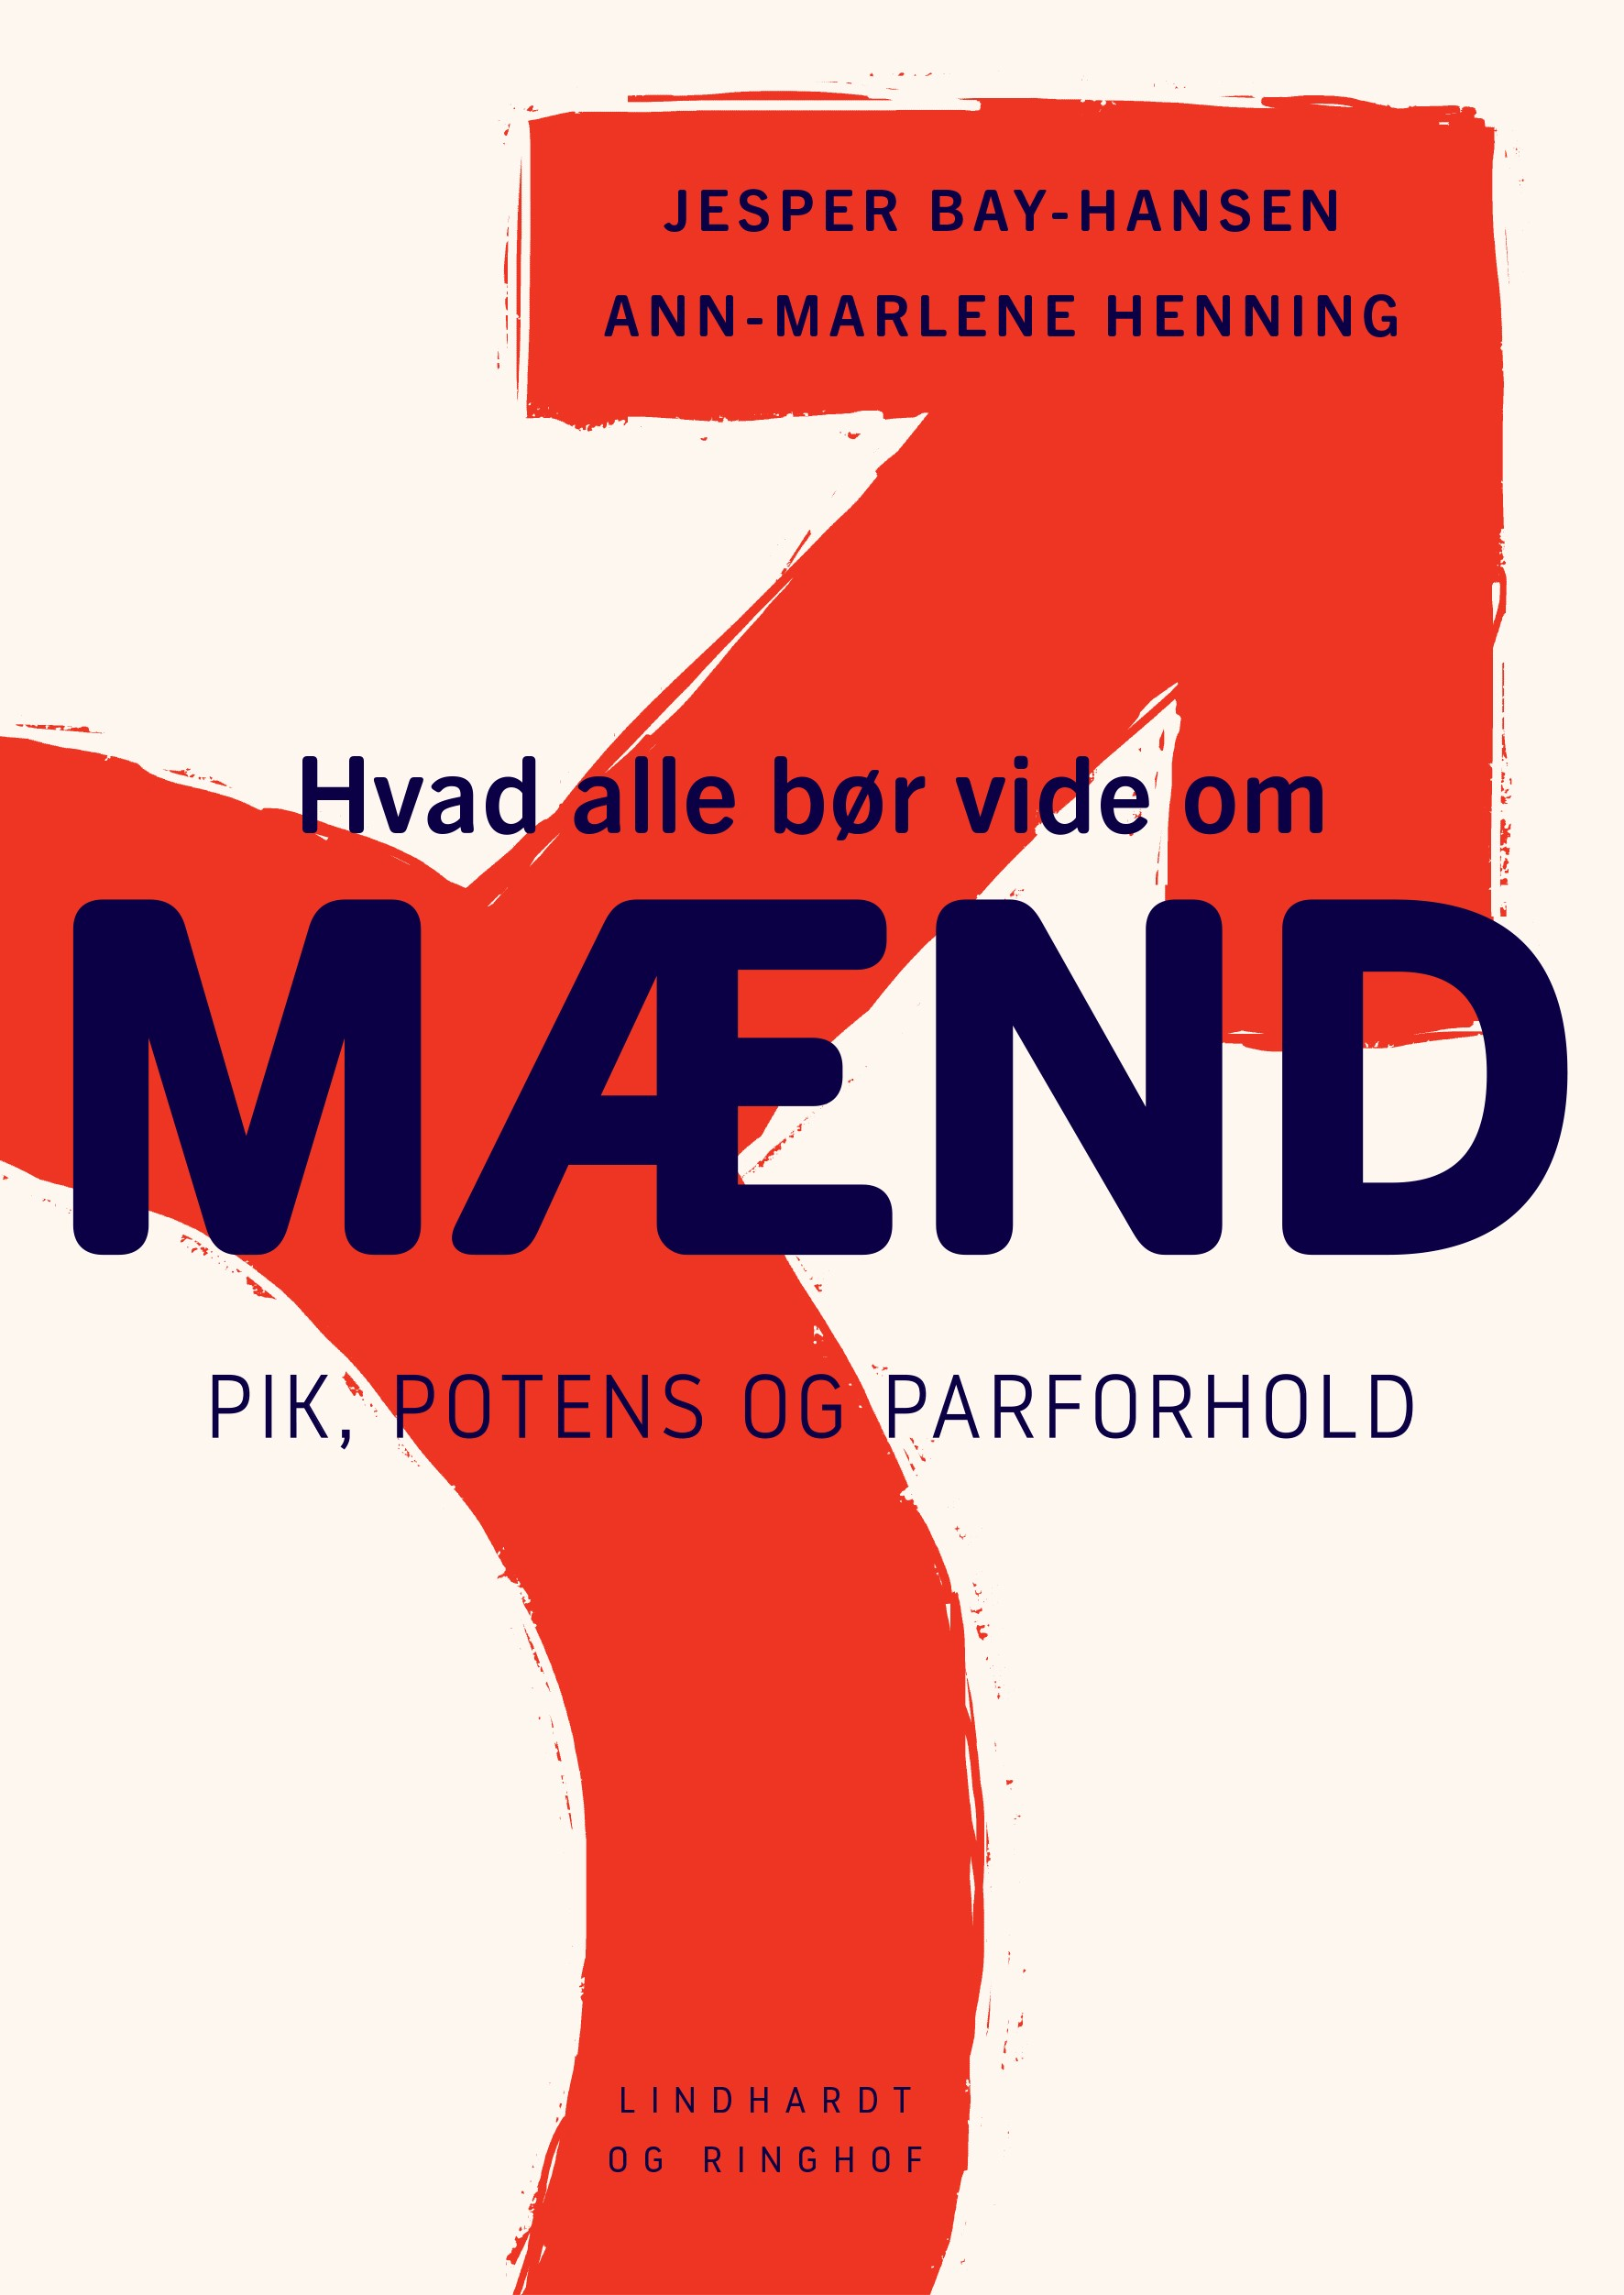 Hvad alle bør vide om mænd, Jesper Bay-Hansen, Ann-Marlene Henning, manglende sexlyst